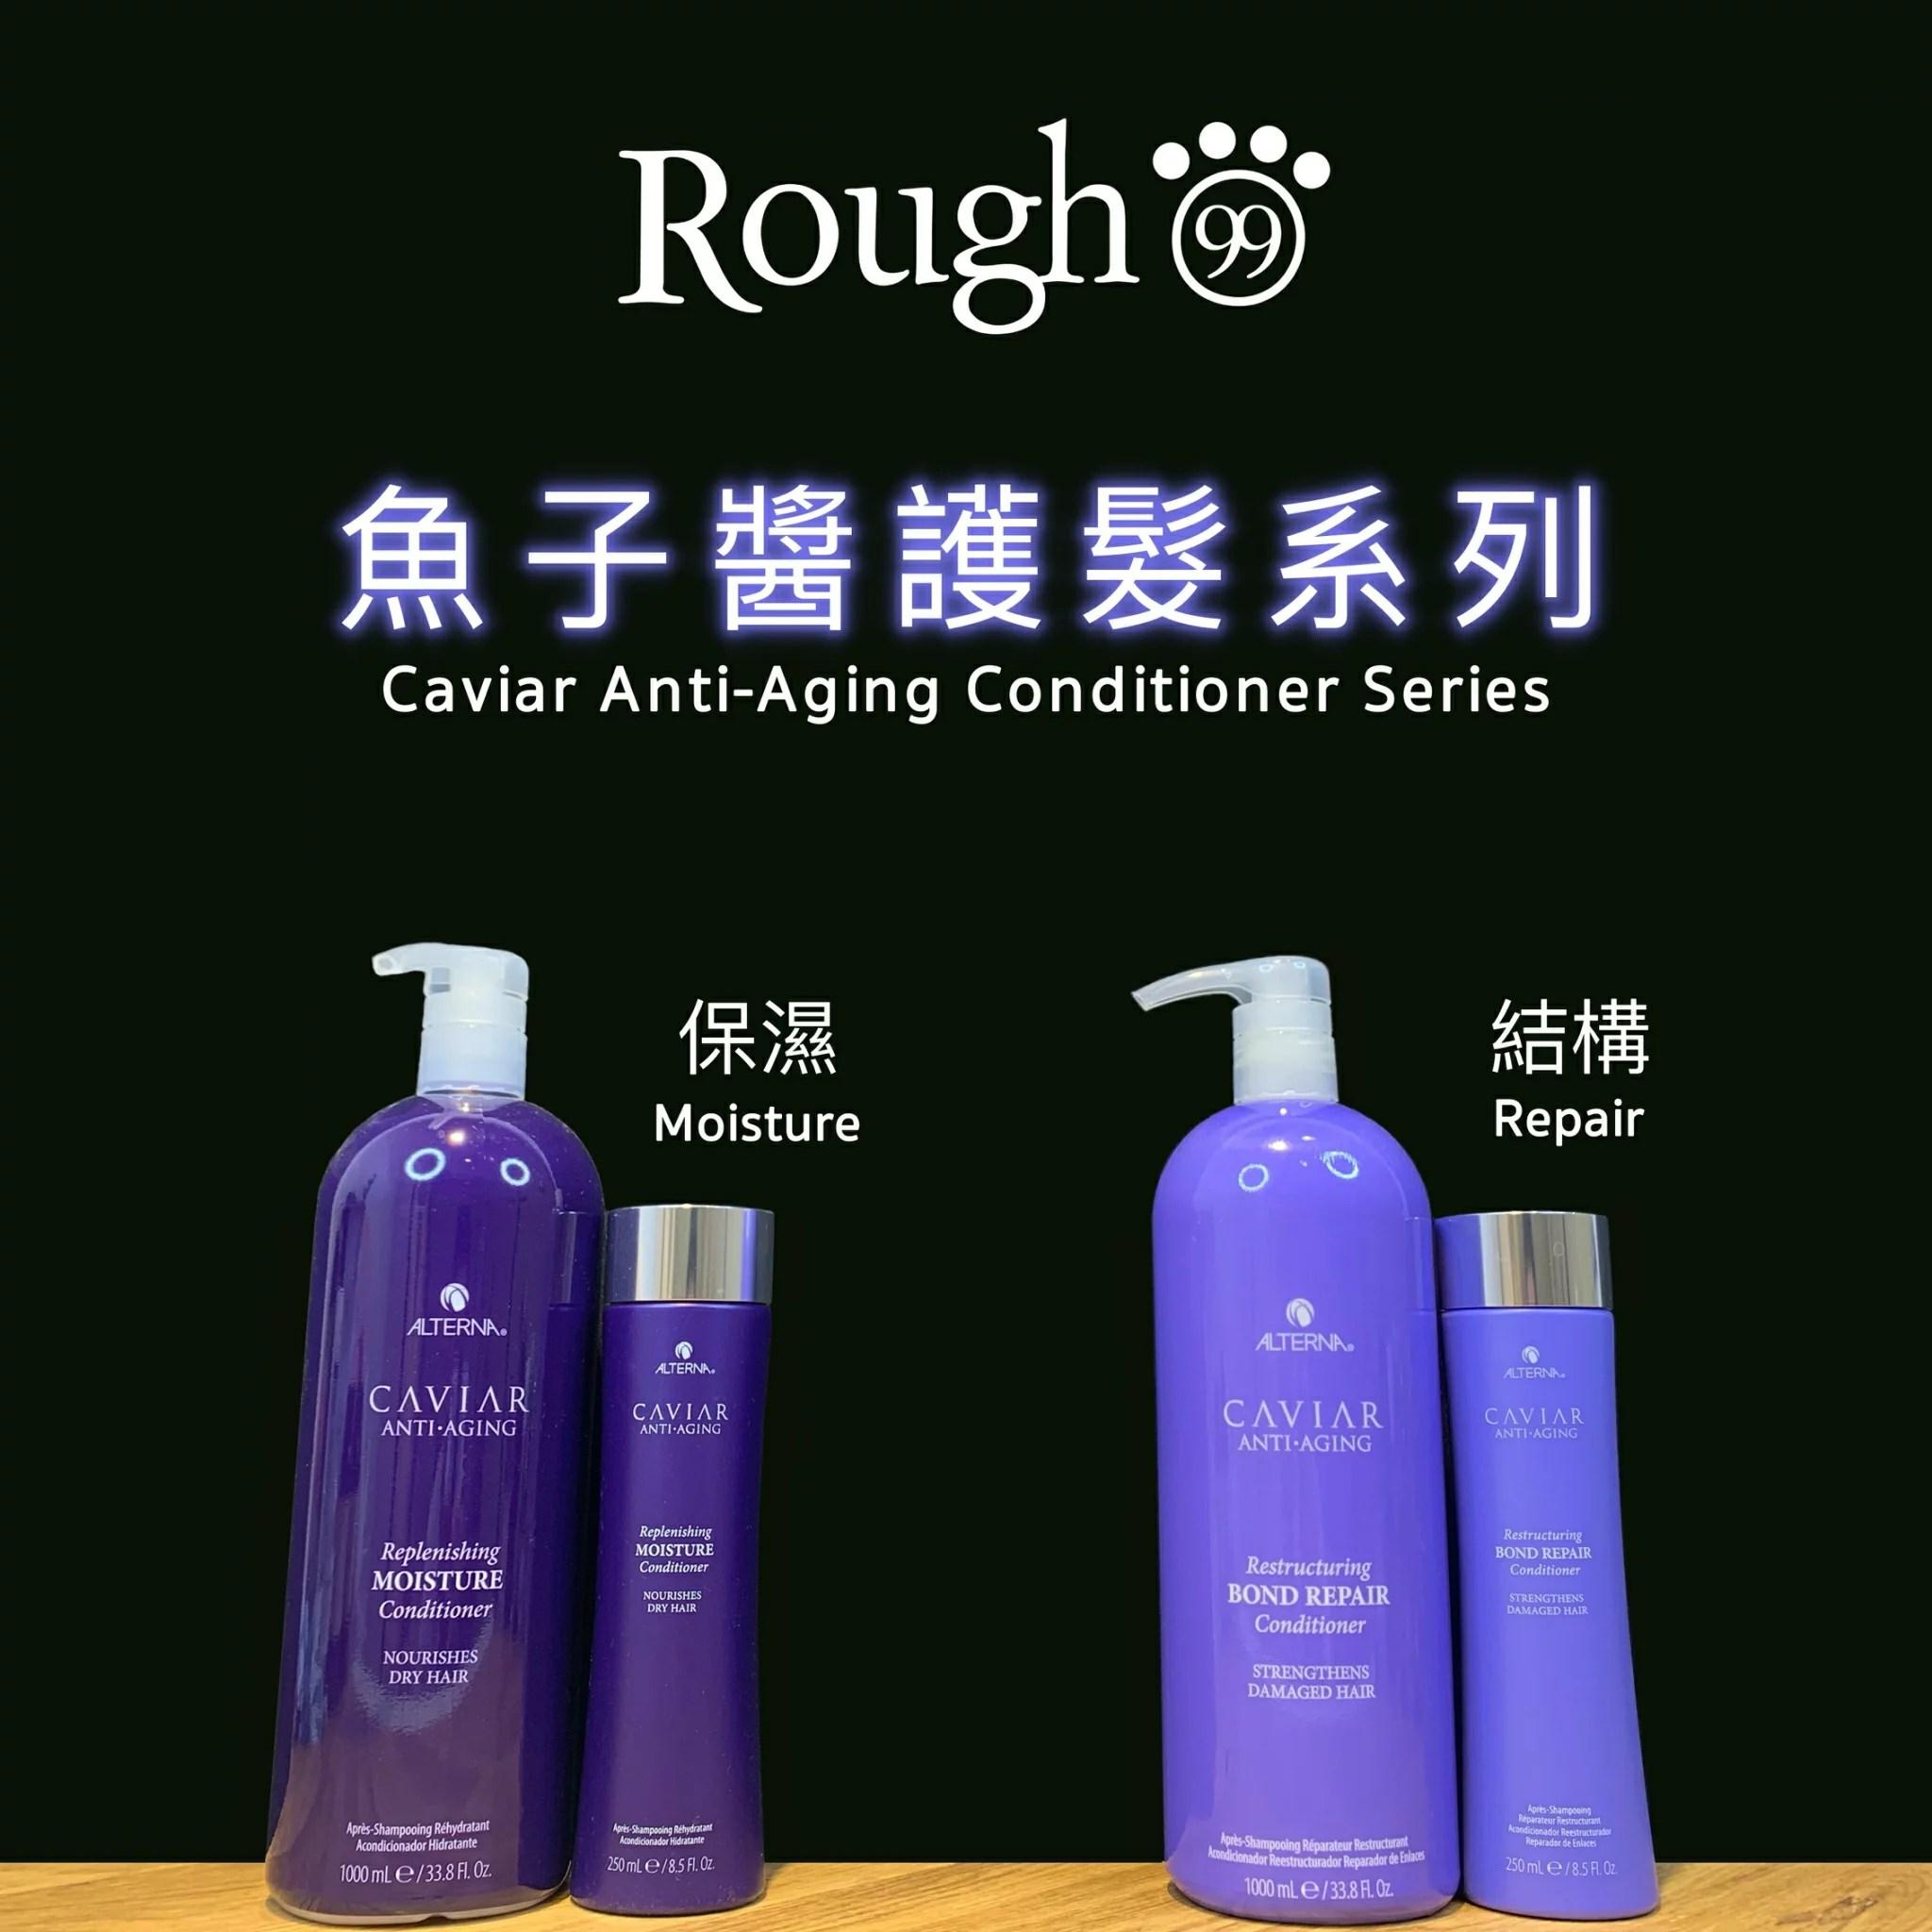 【Rough99】ALTERNA 歐娜 正品公司貨 CAVIAR 魚子醬 魚子保濕護髮劑 結構護髮劑 護髮 | Rough99 - Rakuten樂天市場